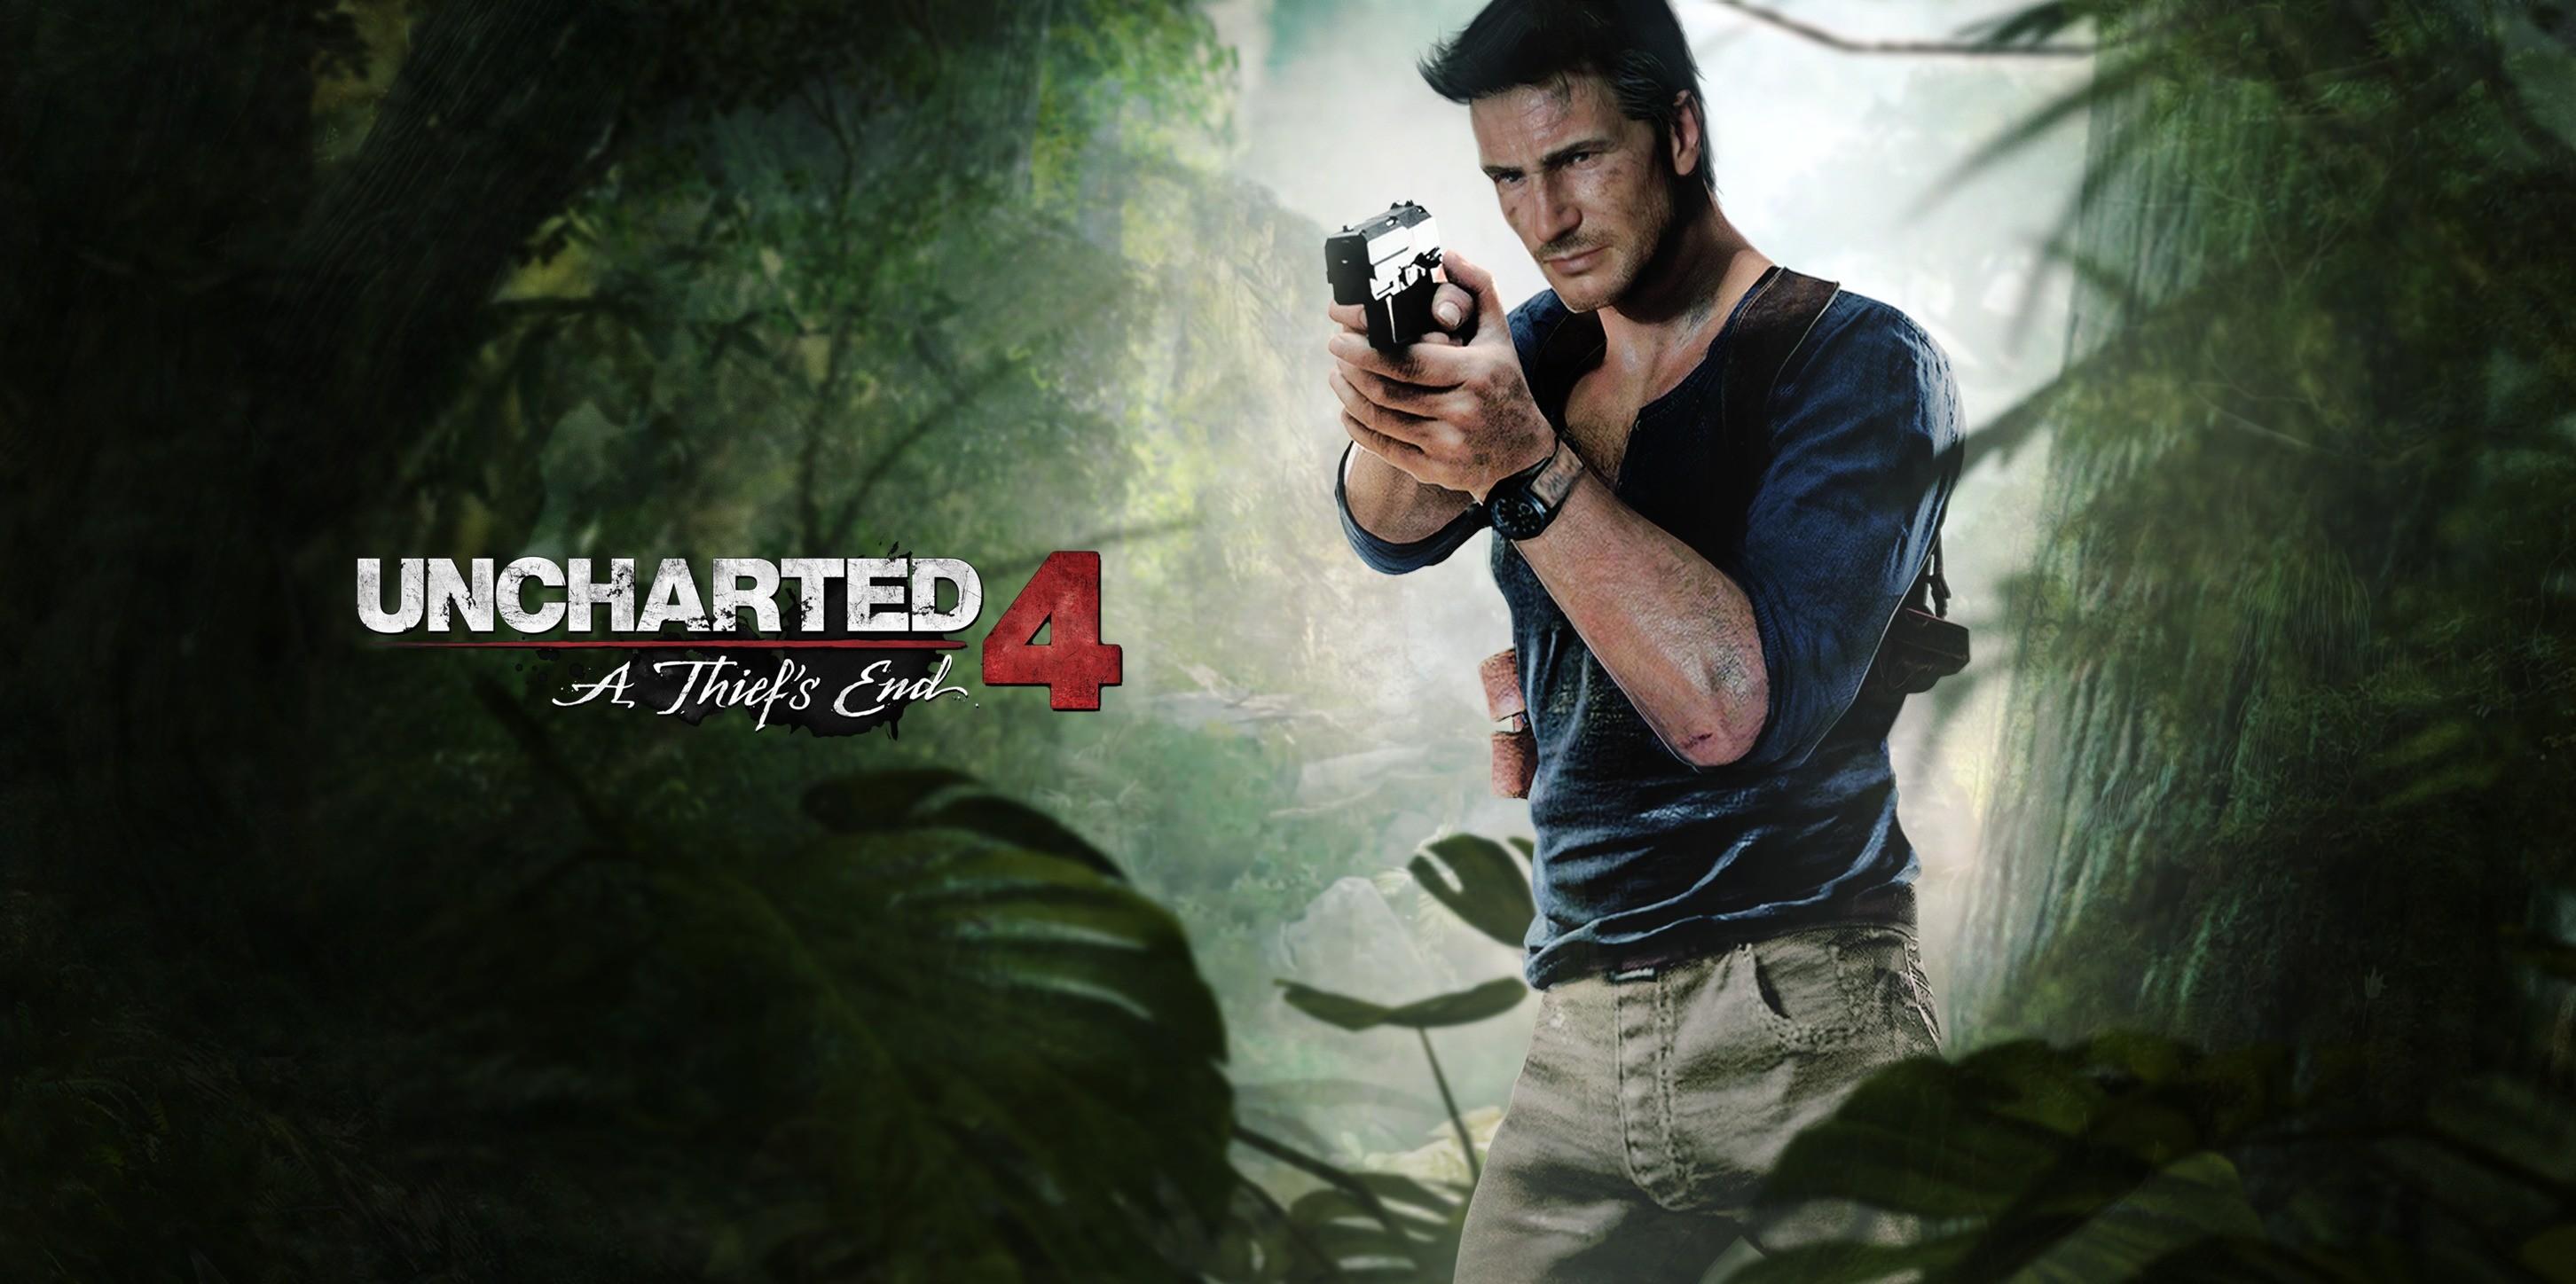 Uncharted 4: A Thief's End HD Desktop